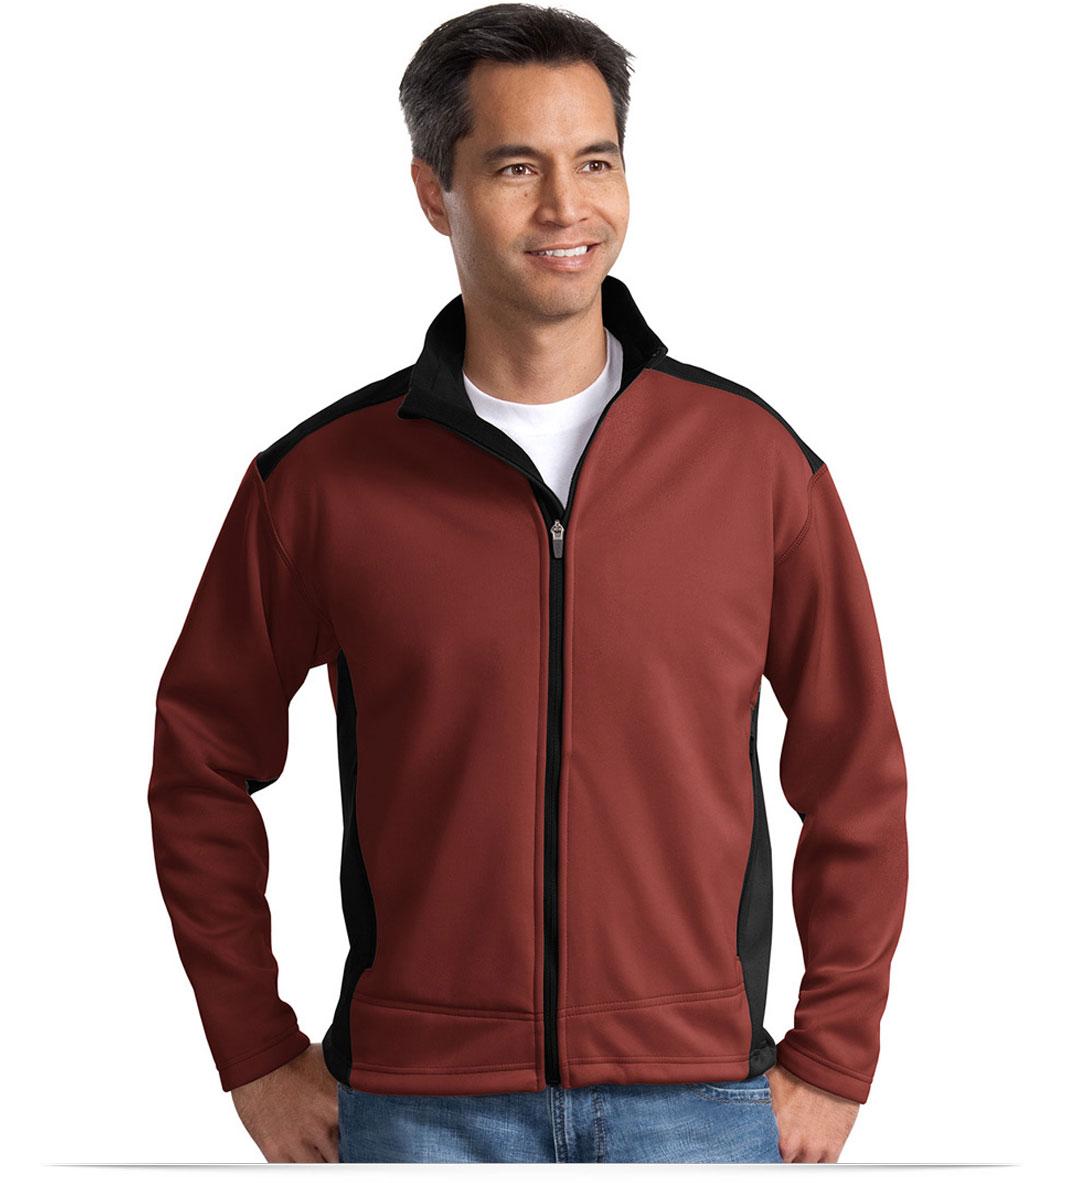 Custom Two-Tone Soft Shell Jacket